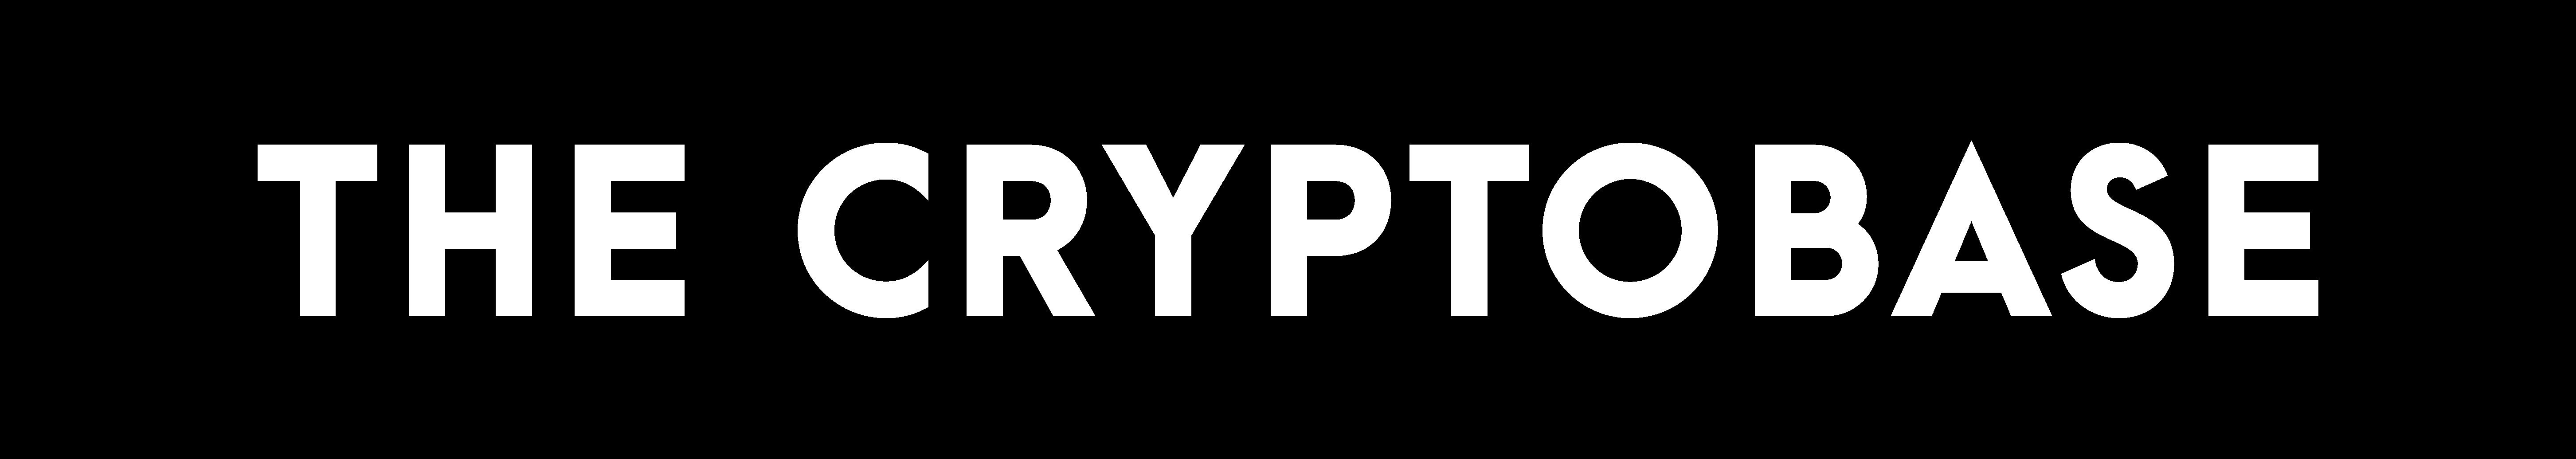 THE CRYPTOBASE